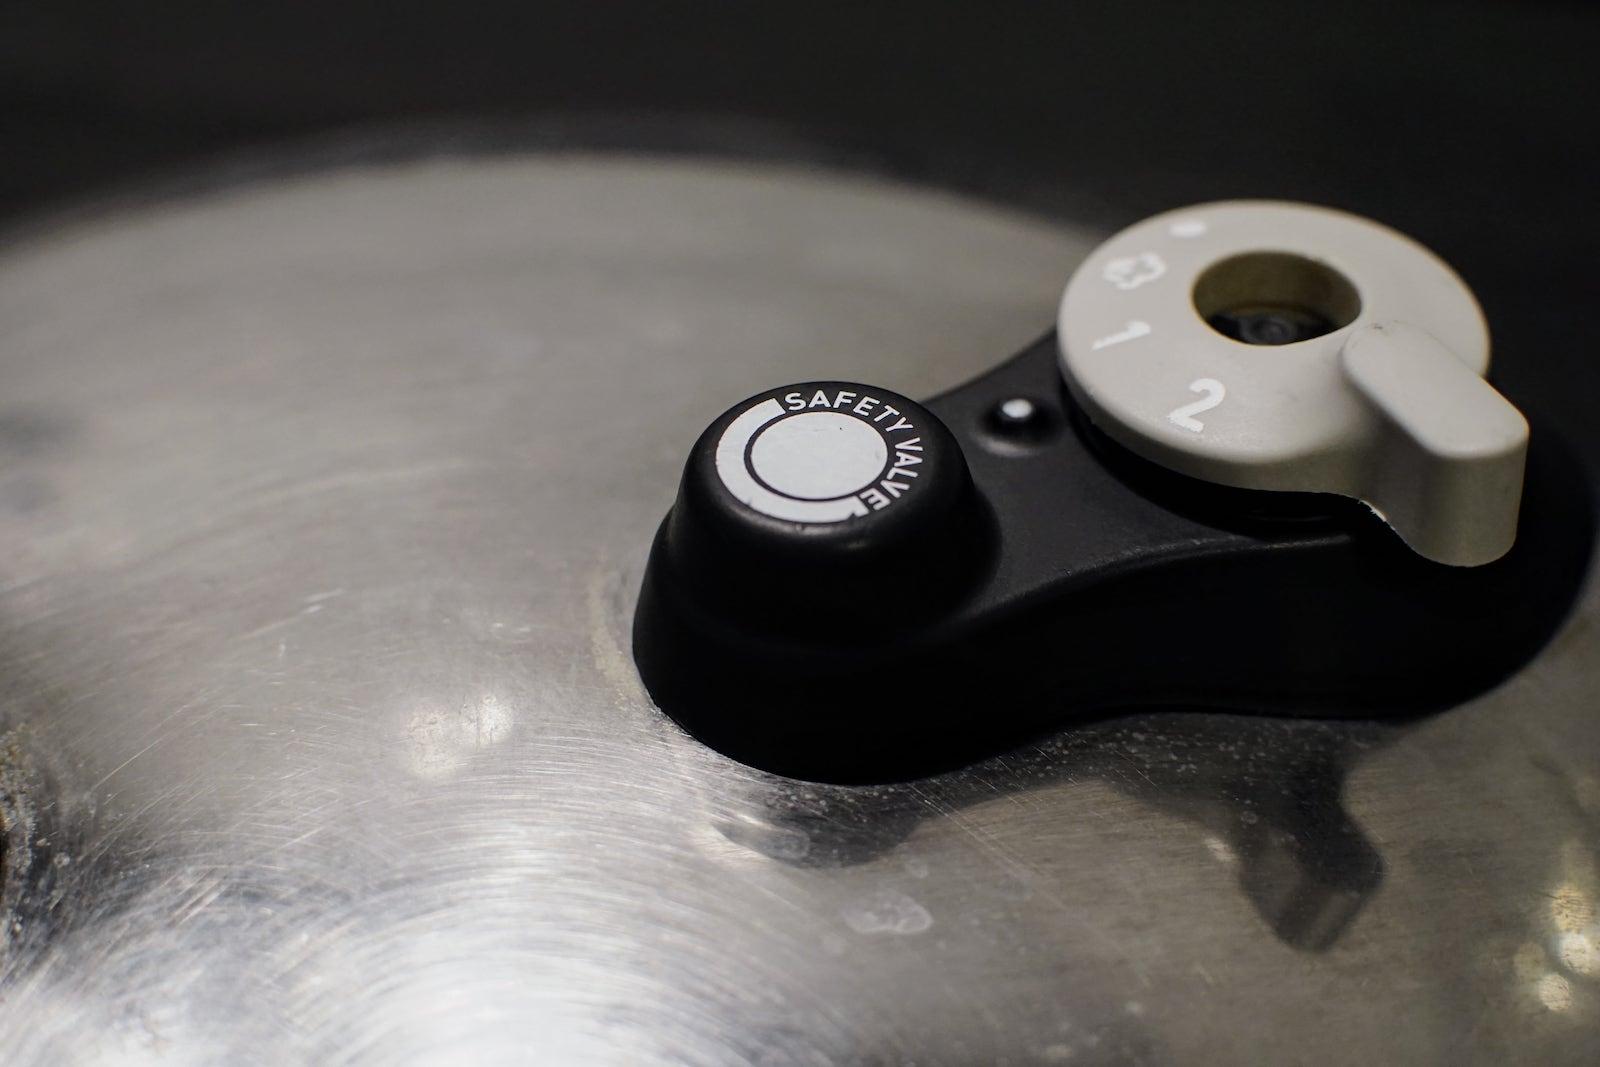 Takip ng pressure cooker